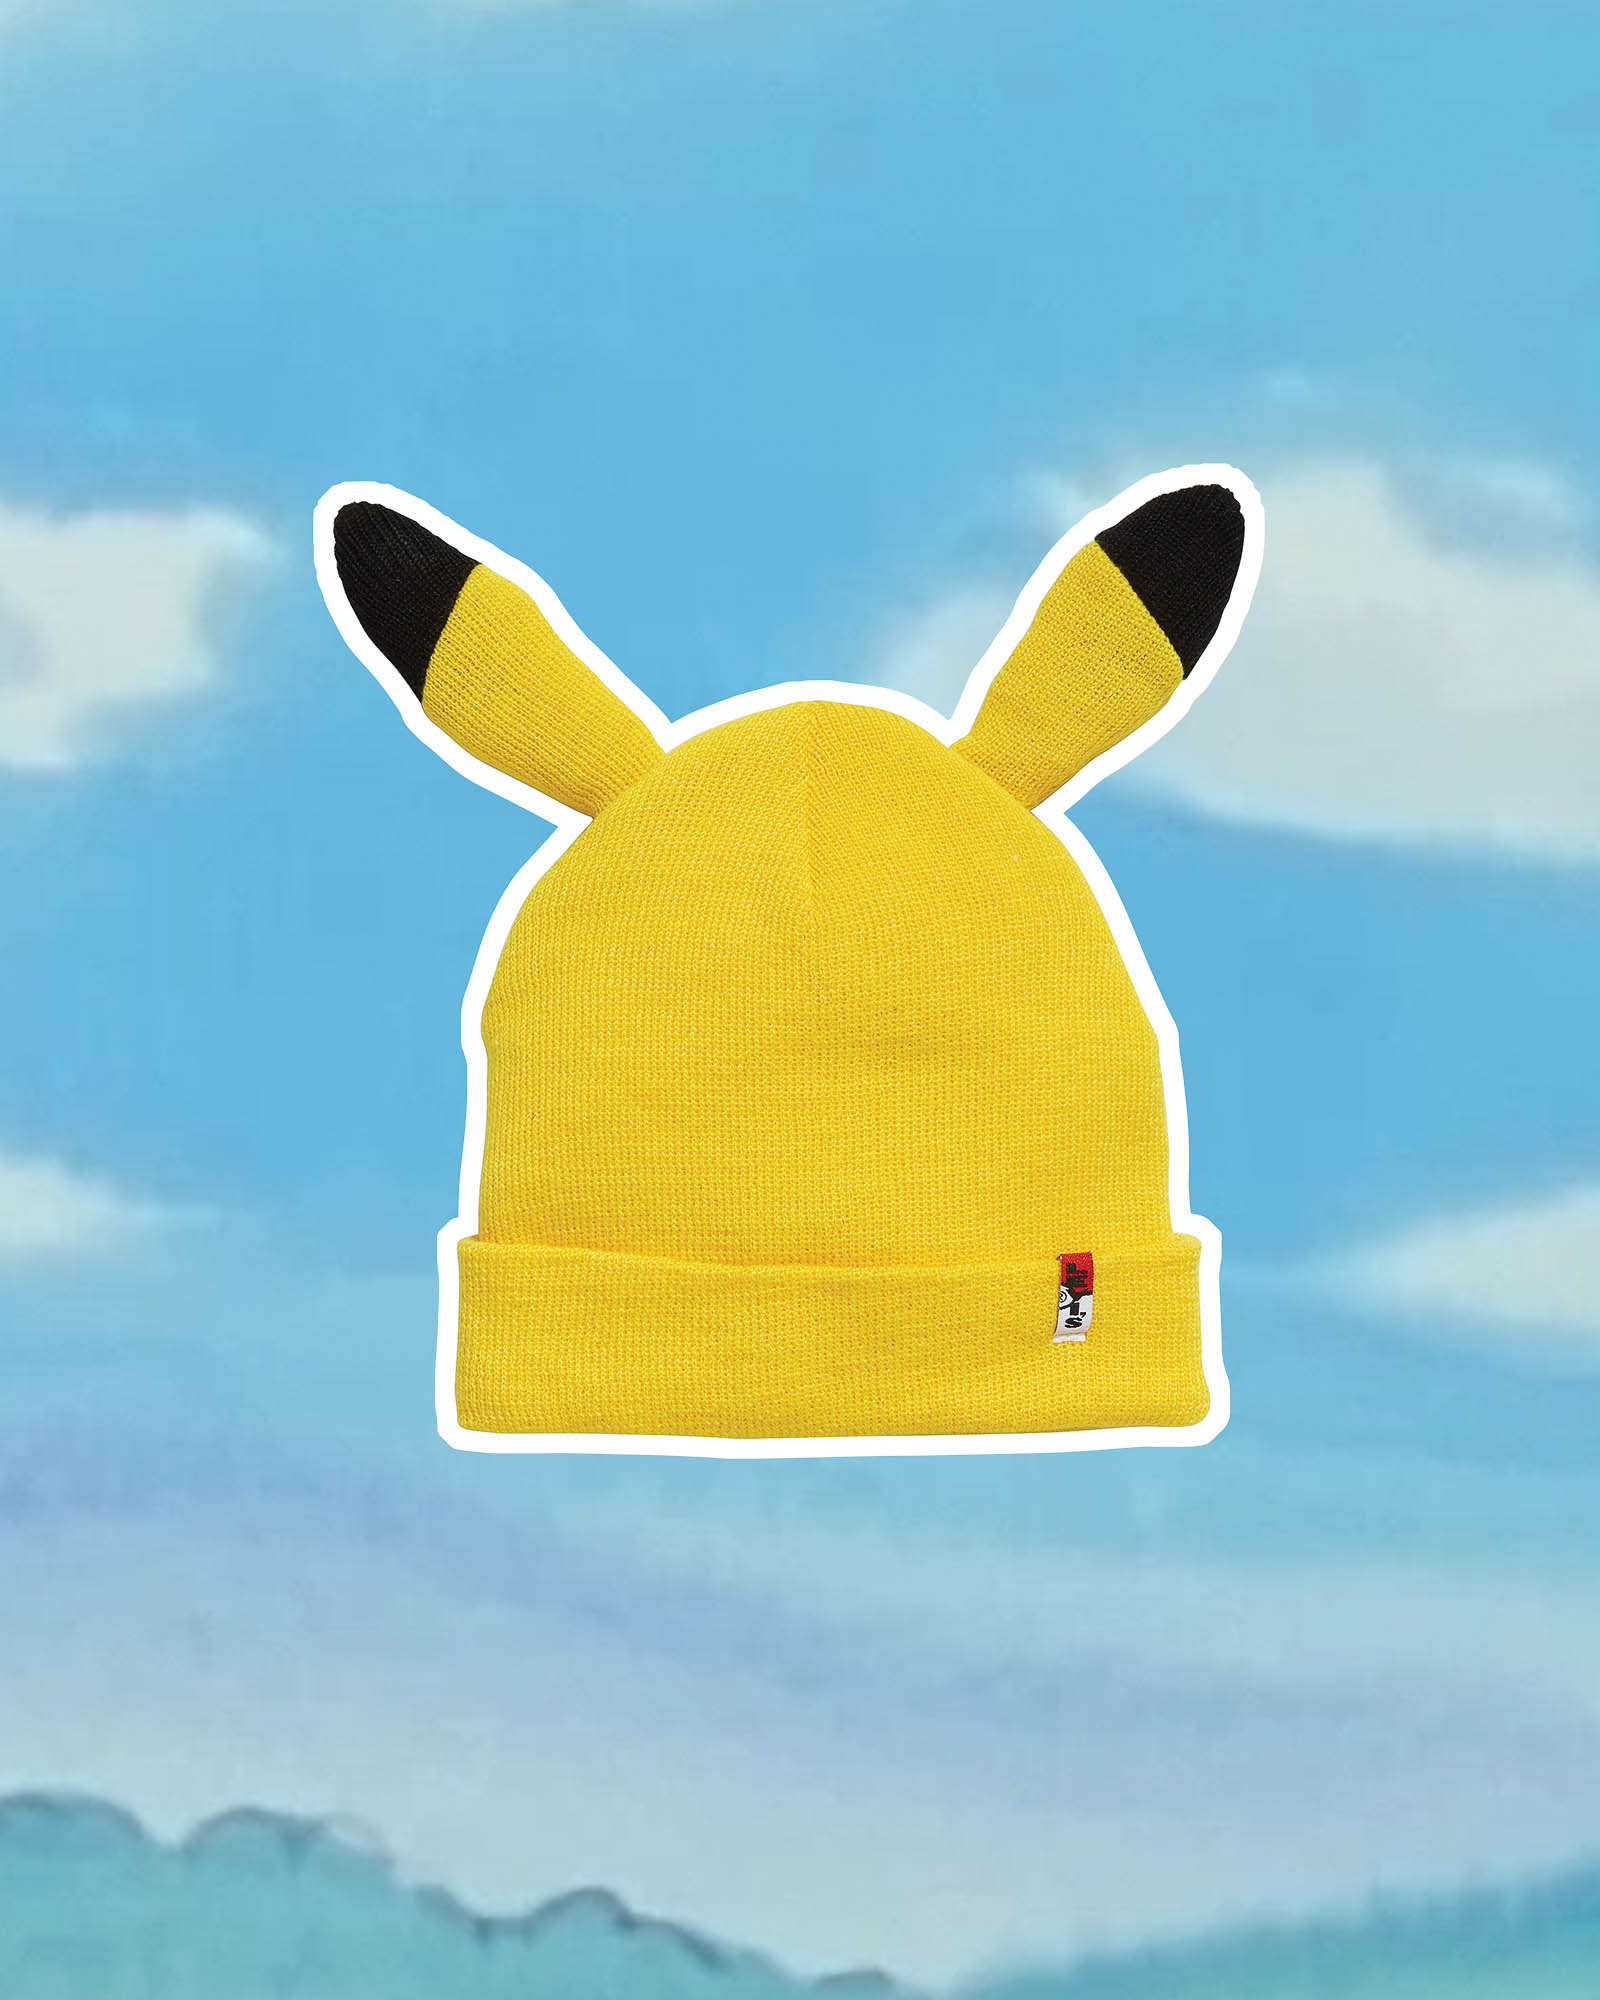 21_H1_Pokemon_Group_404_Accessories_05_CMYK